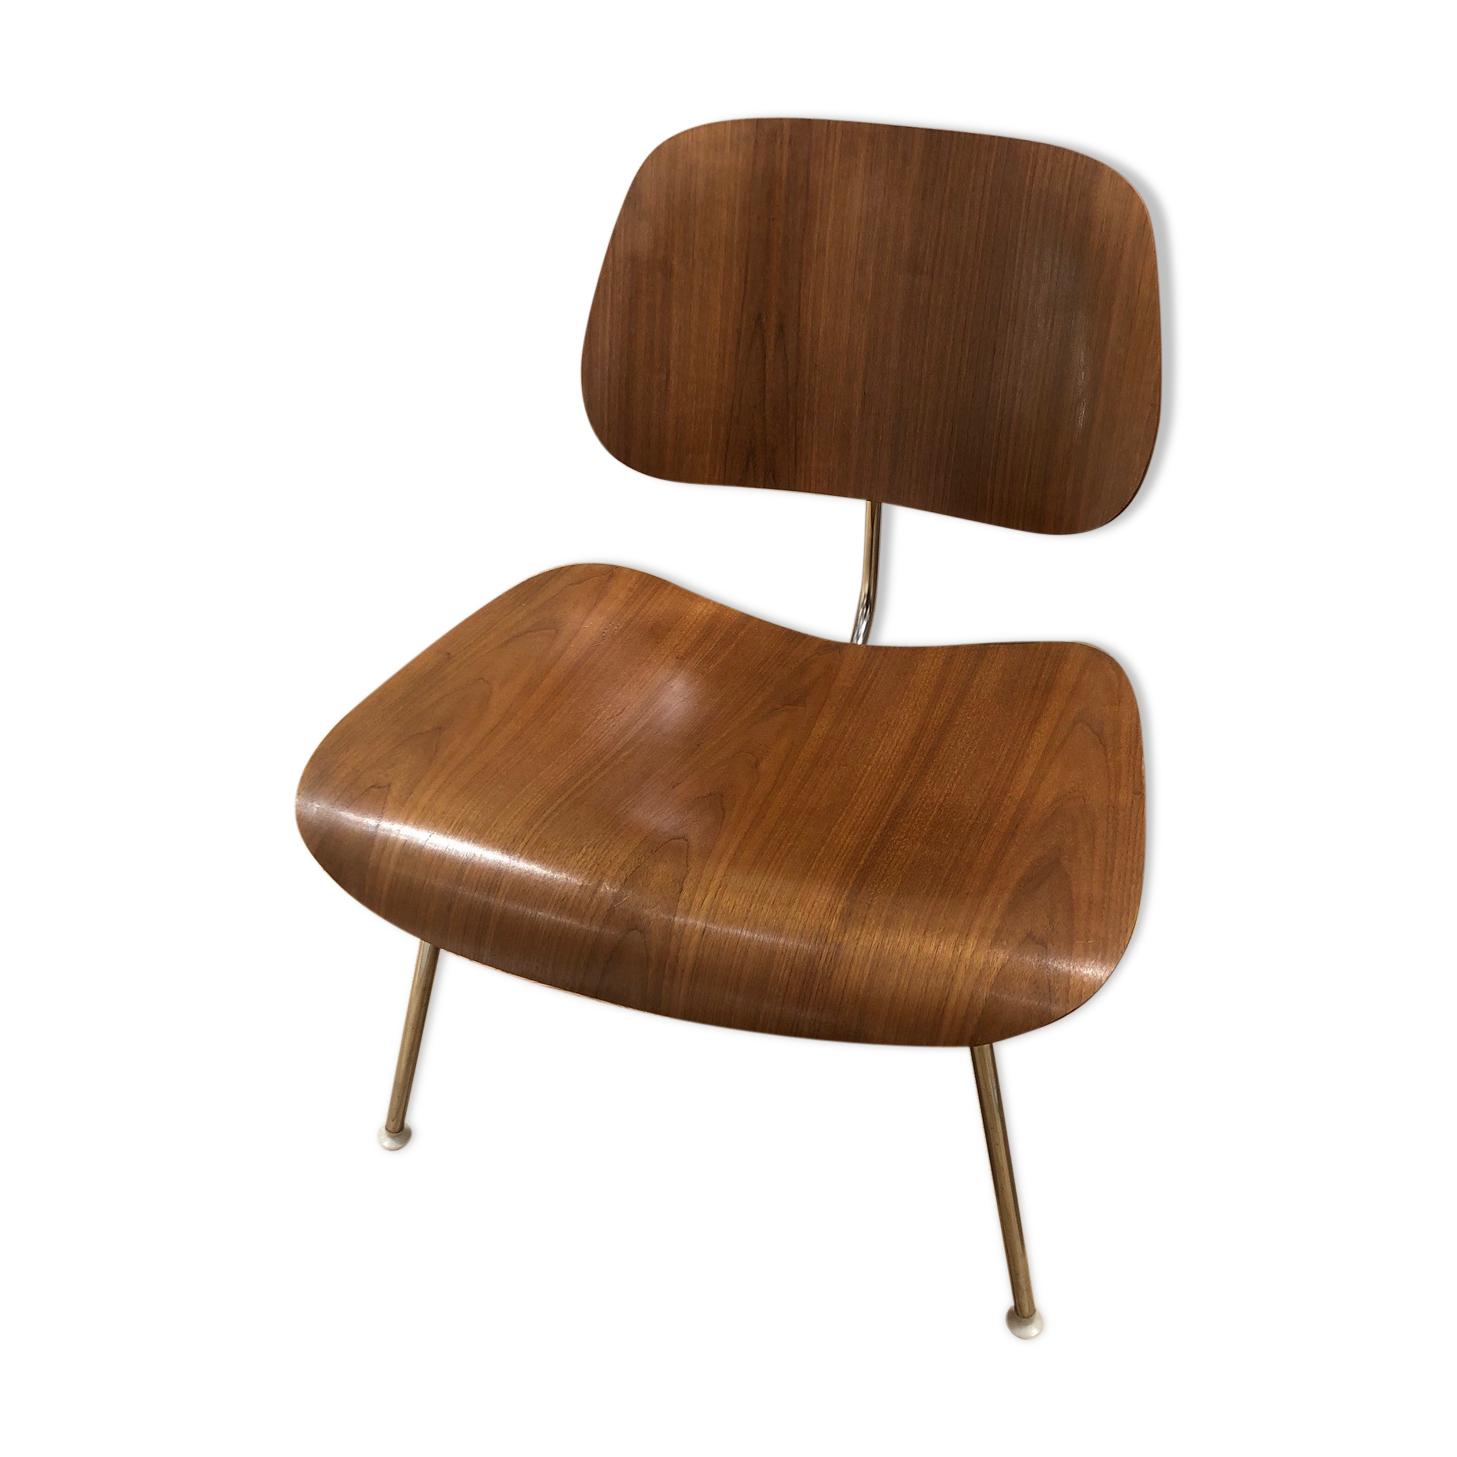 Chaise LCM en palissandre de Charles & Ray Eames édition Herman Miller